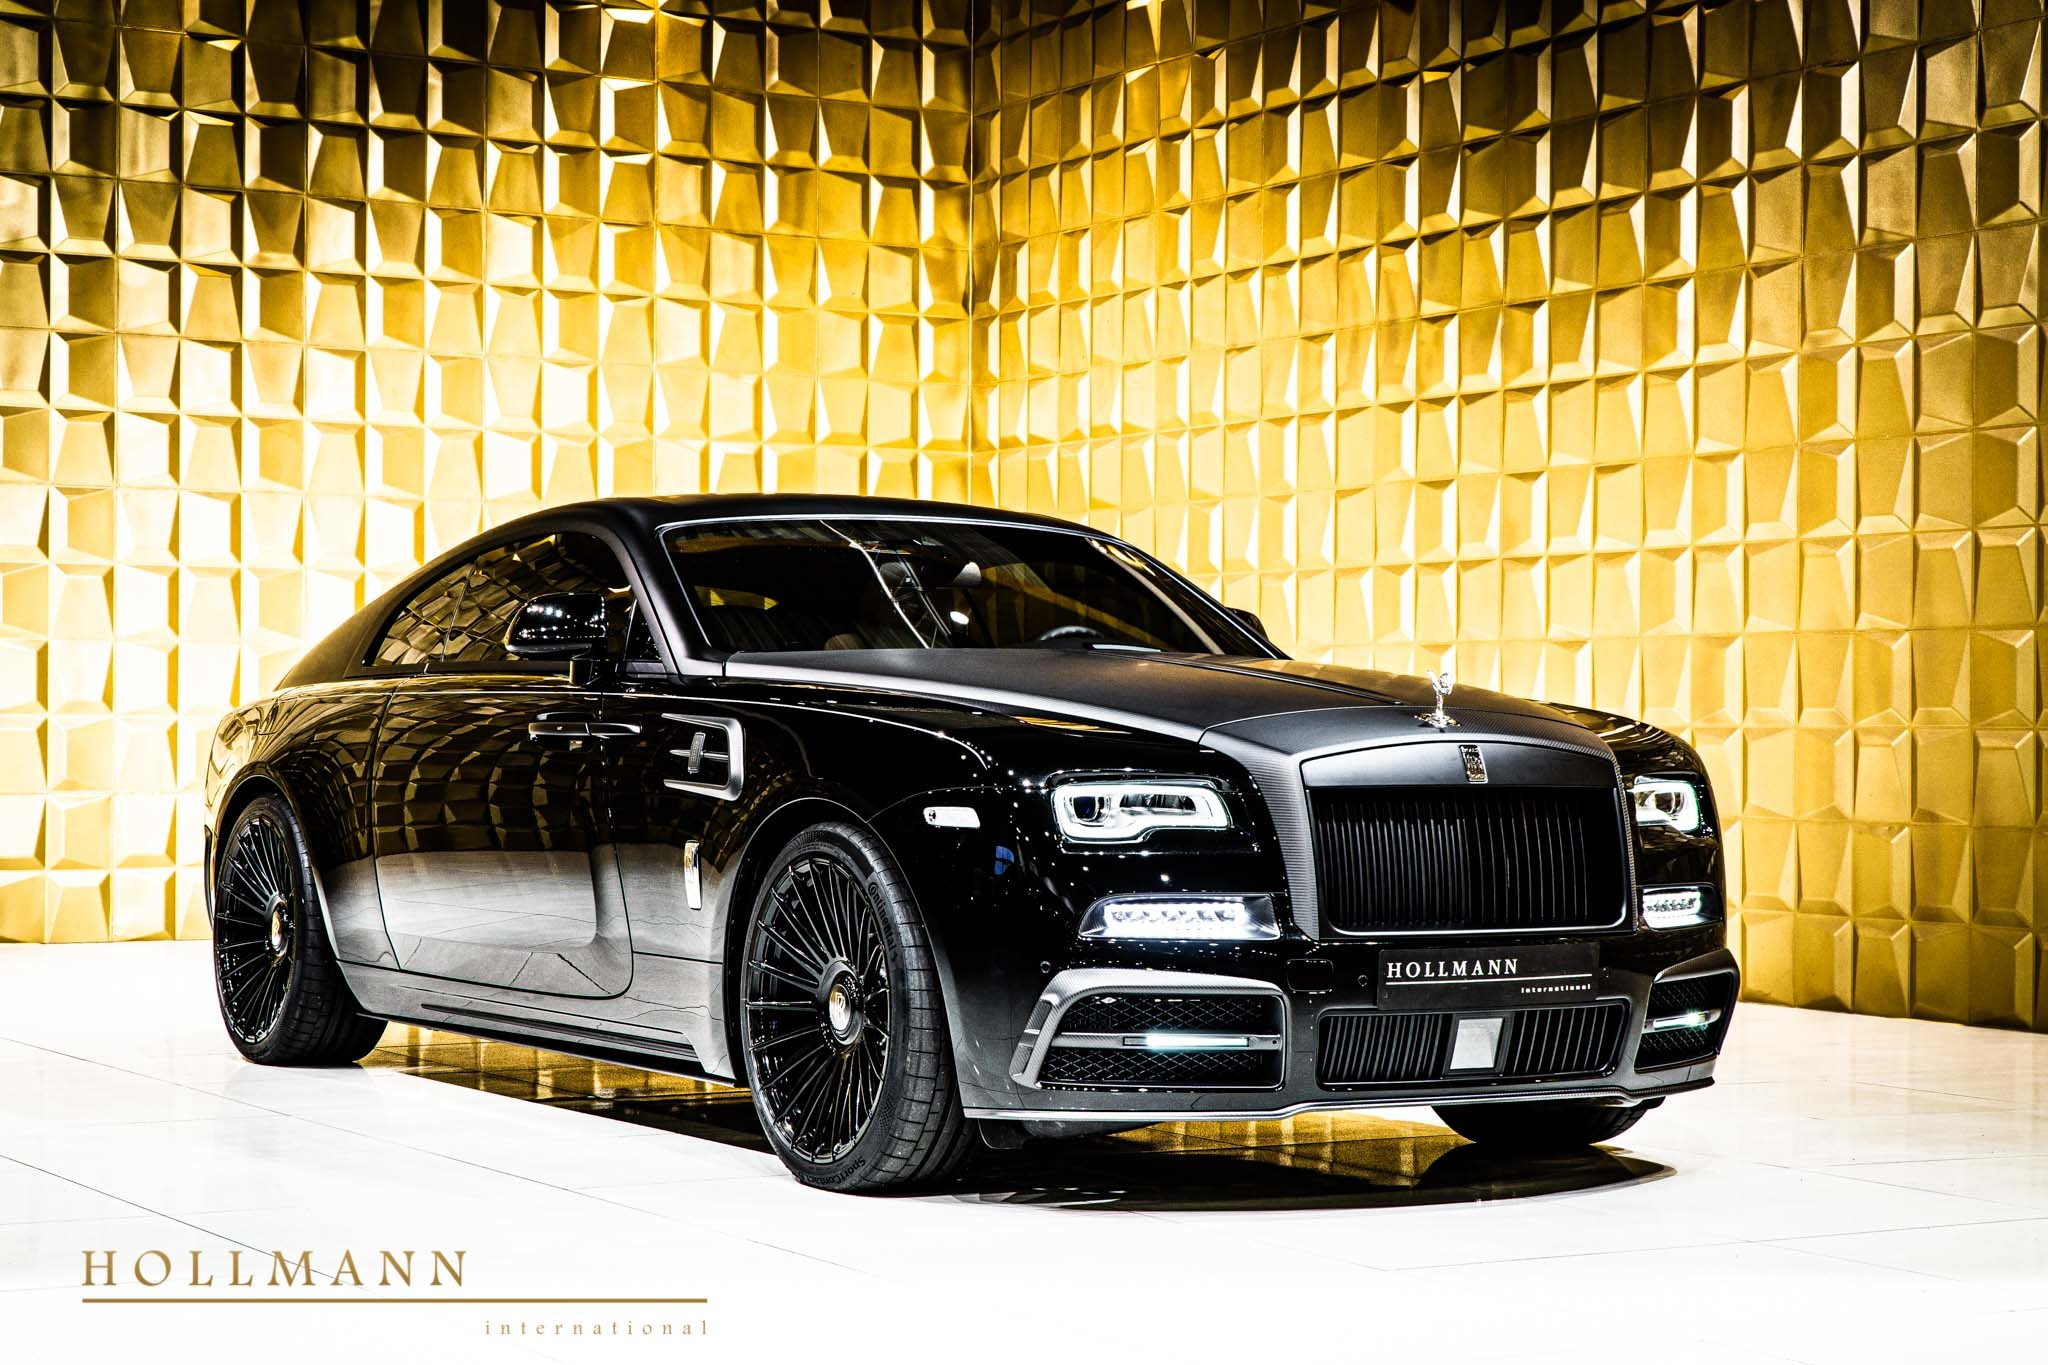 Rolls Royce Wraith By Mansory Hollmann International Germany For Sale On Luxurypulse